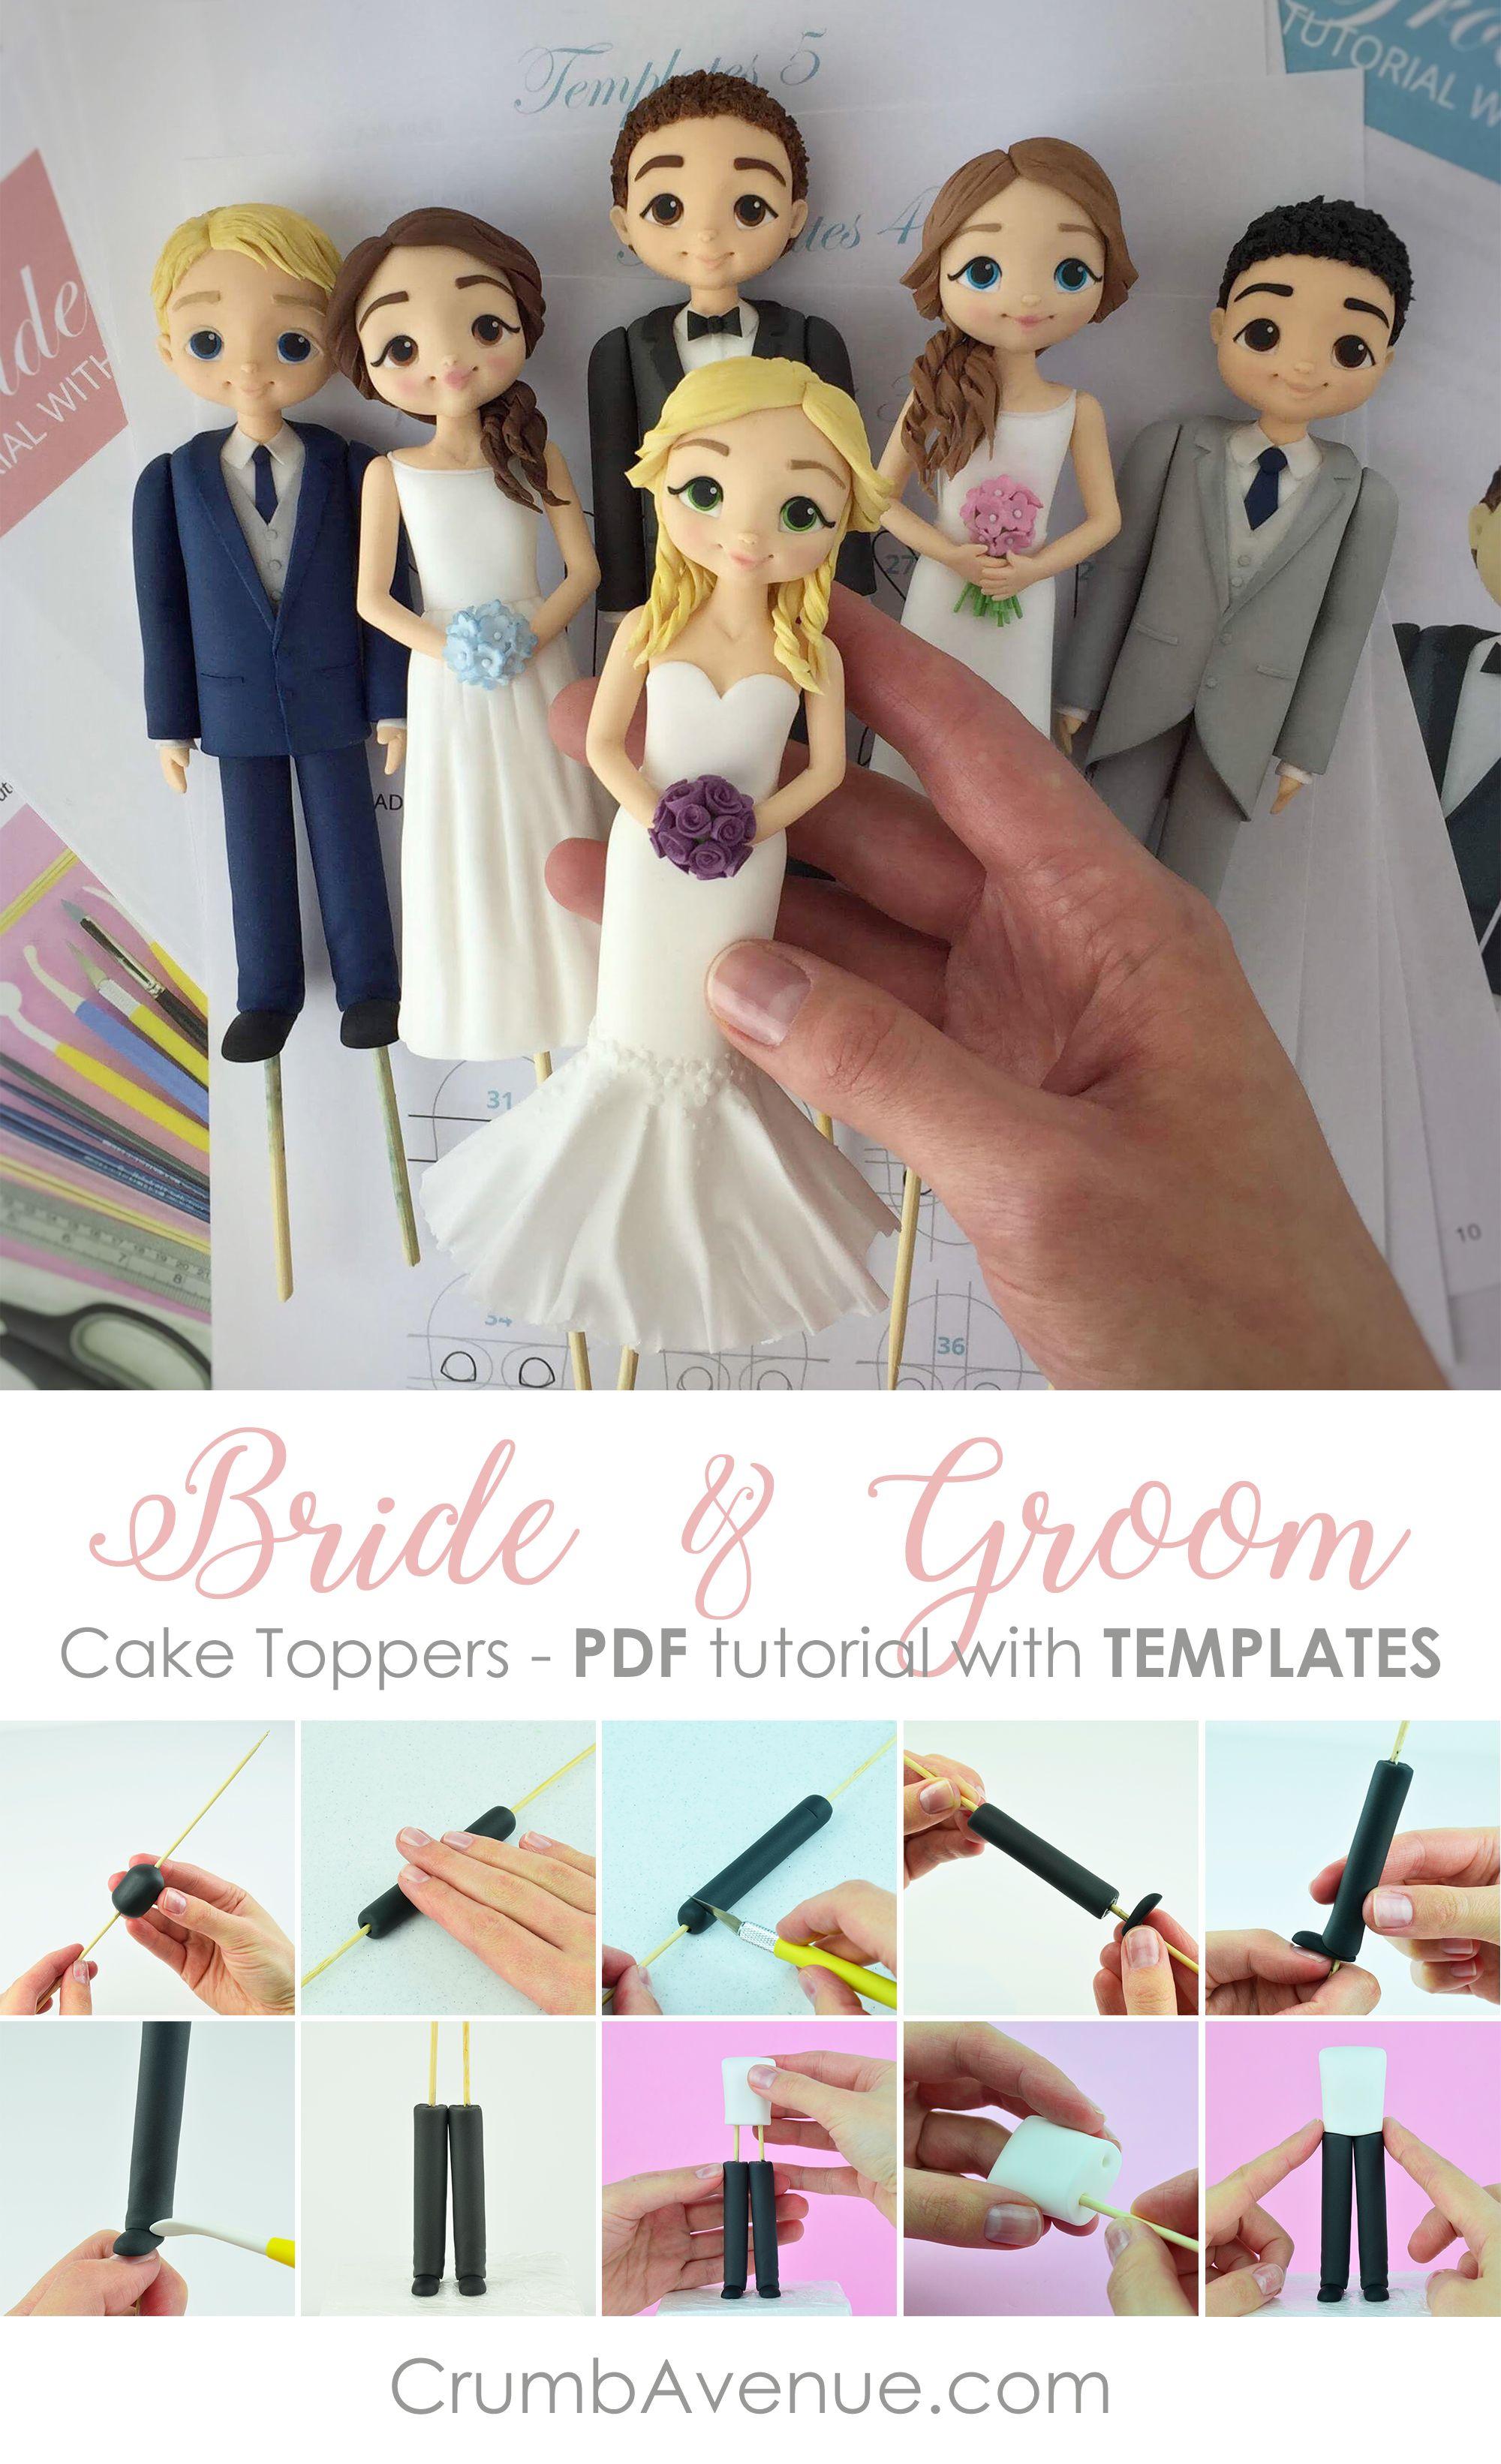 Bride u groom cake toppers pdf tutorial with templates gum paste